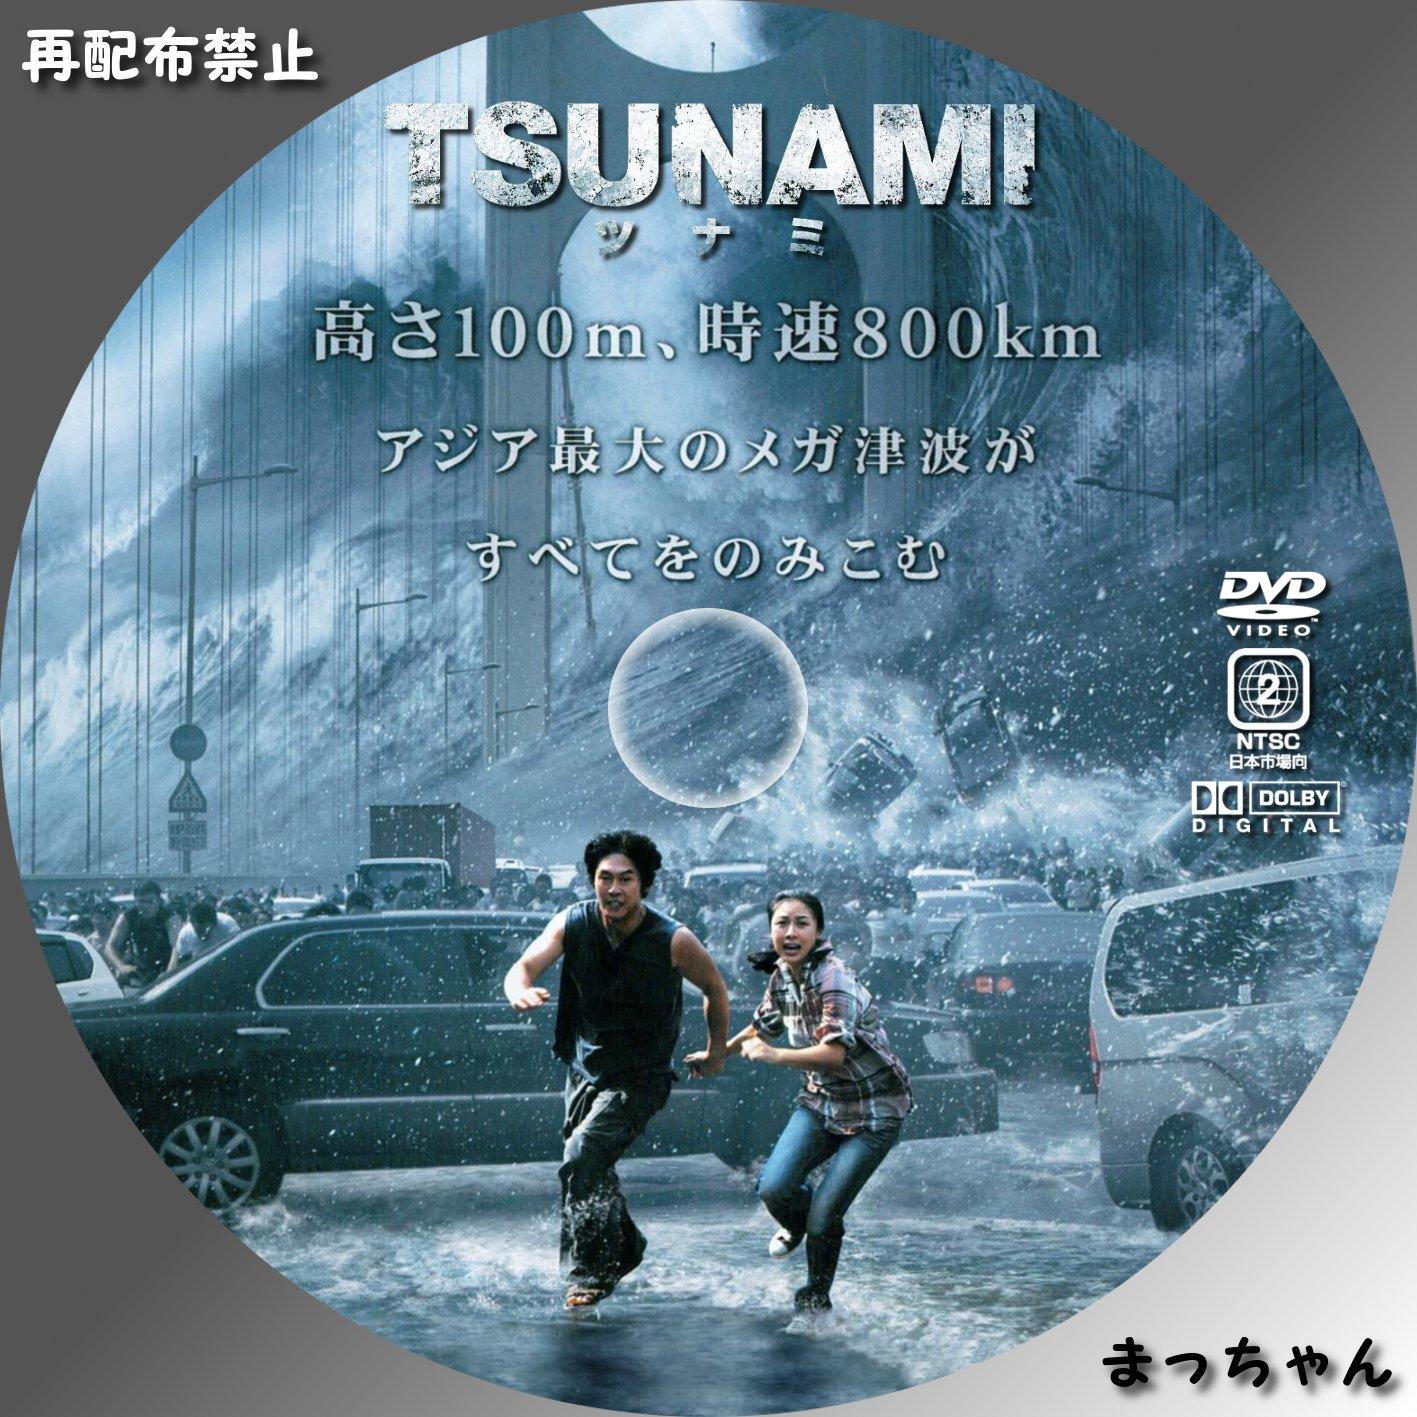 TSUNAMI-01.jpg